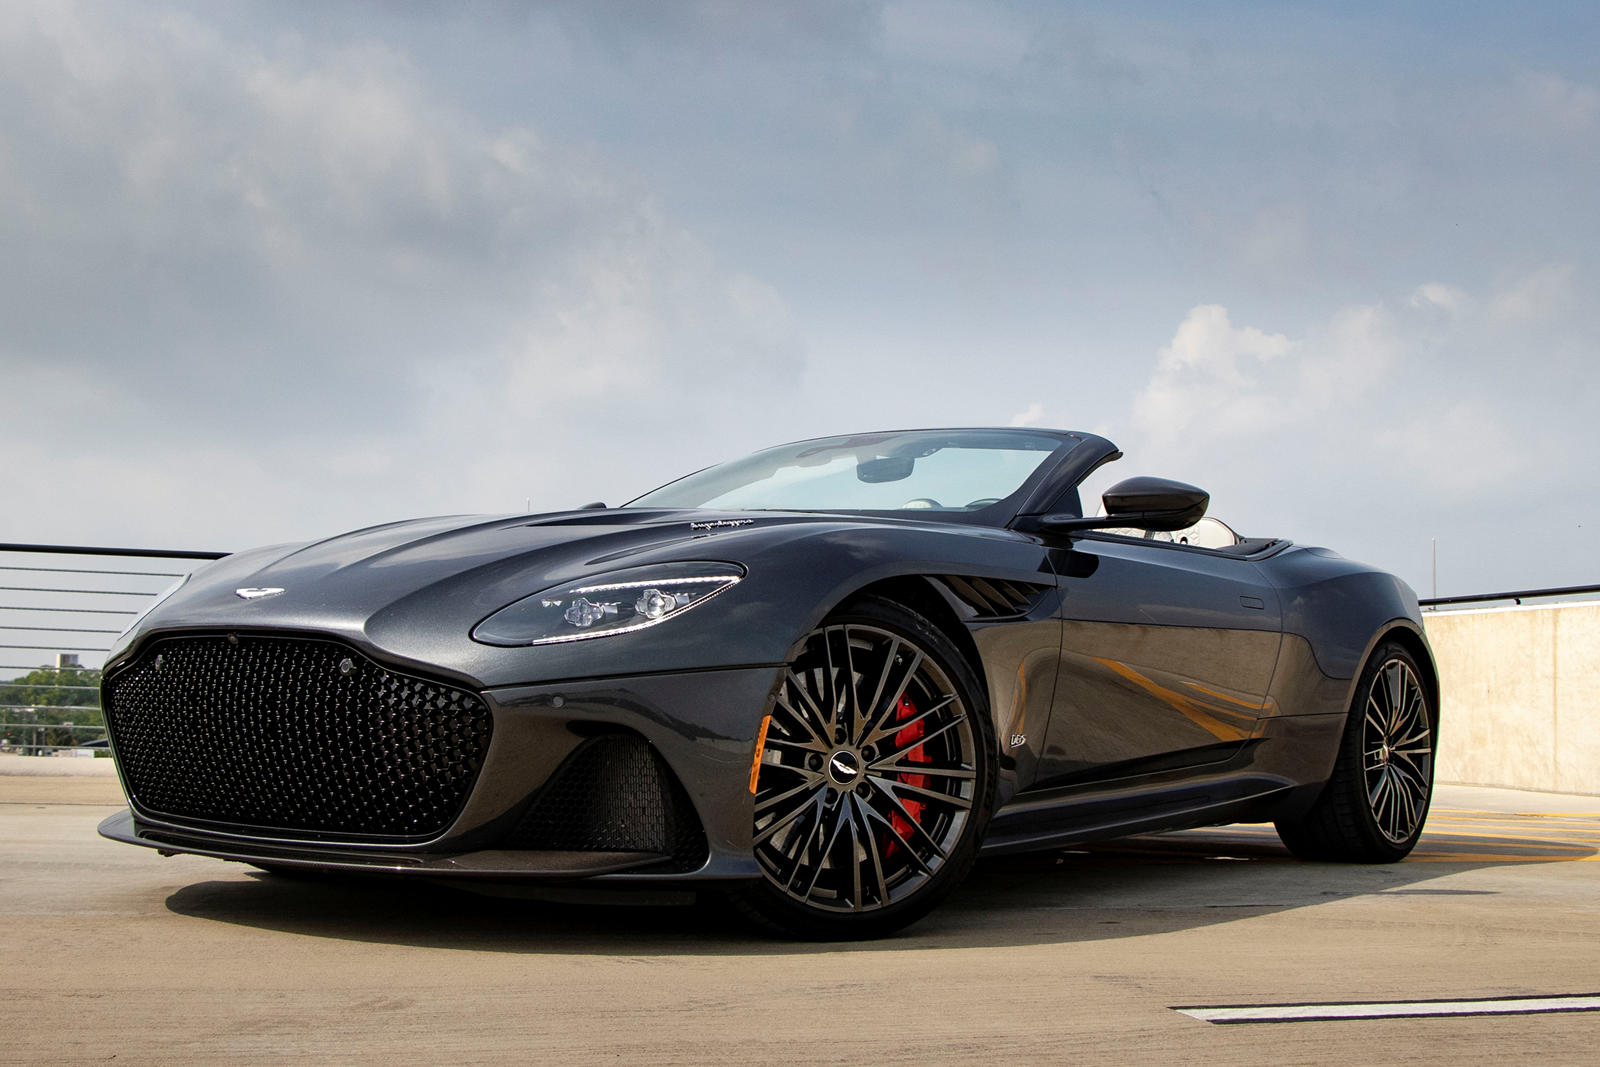 10 Must See Features Of The Aston Martin Dbs Superleggera Volante Carbuzz